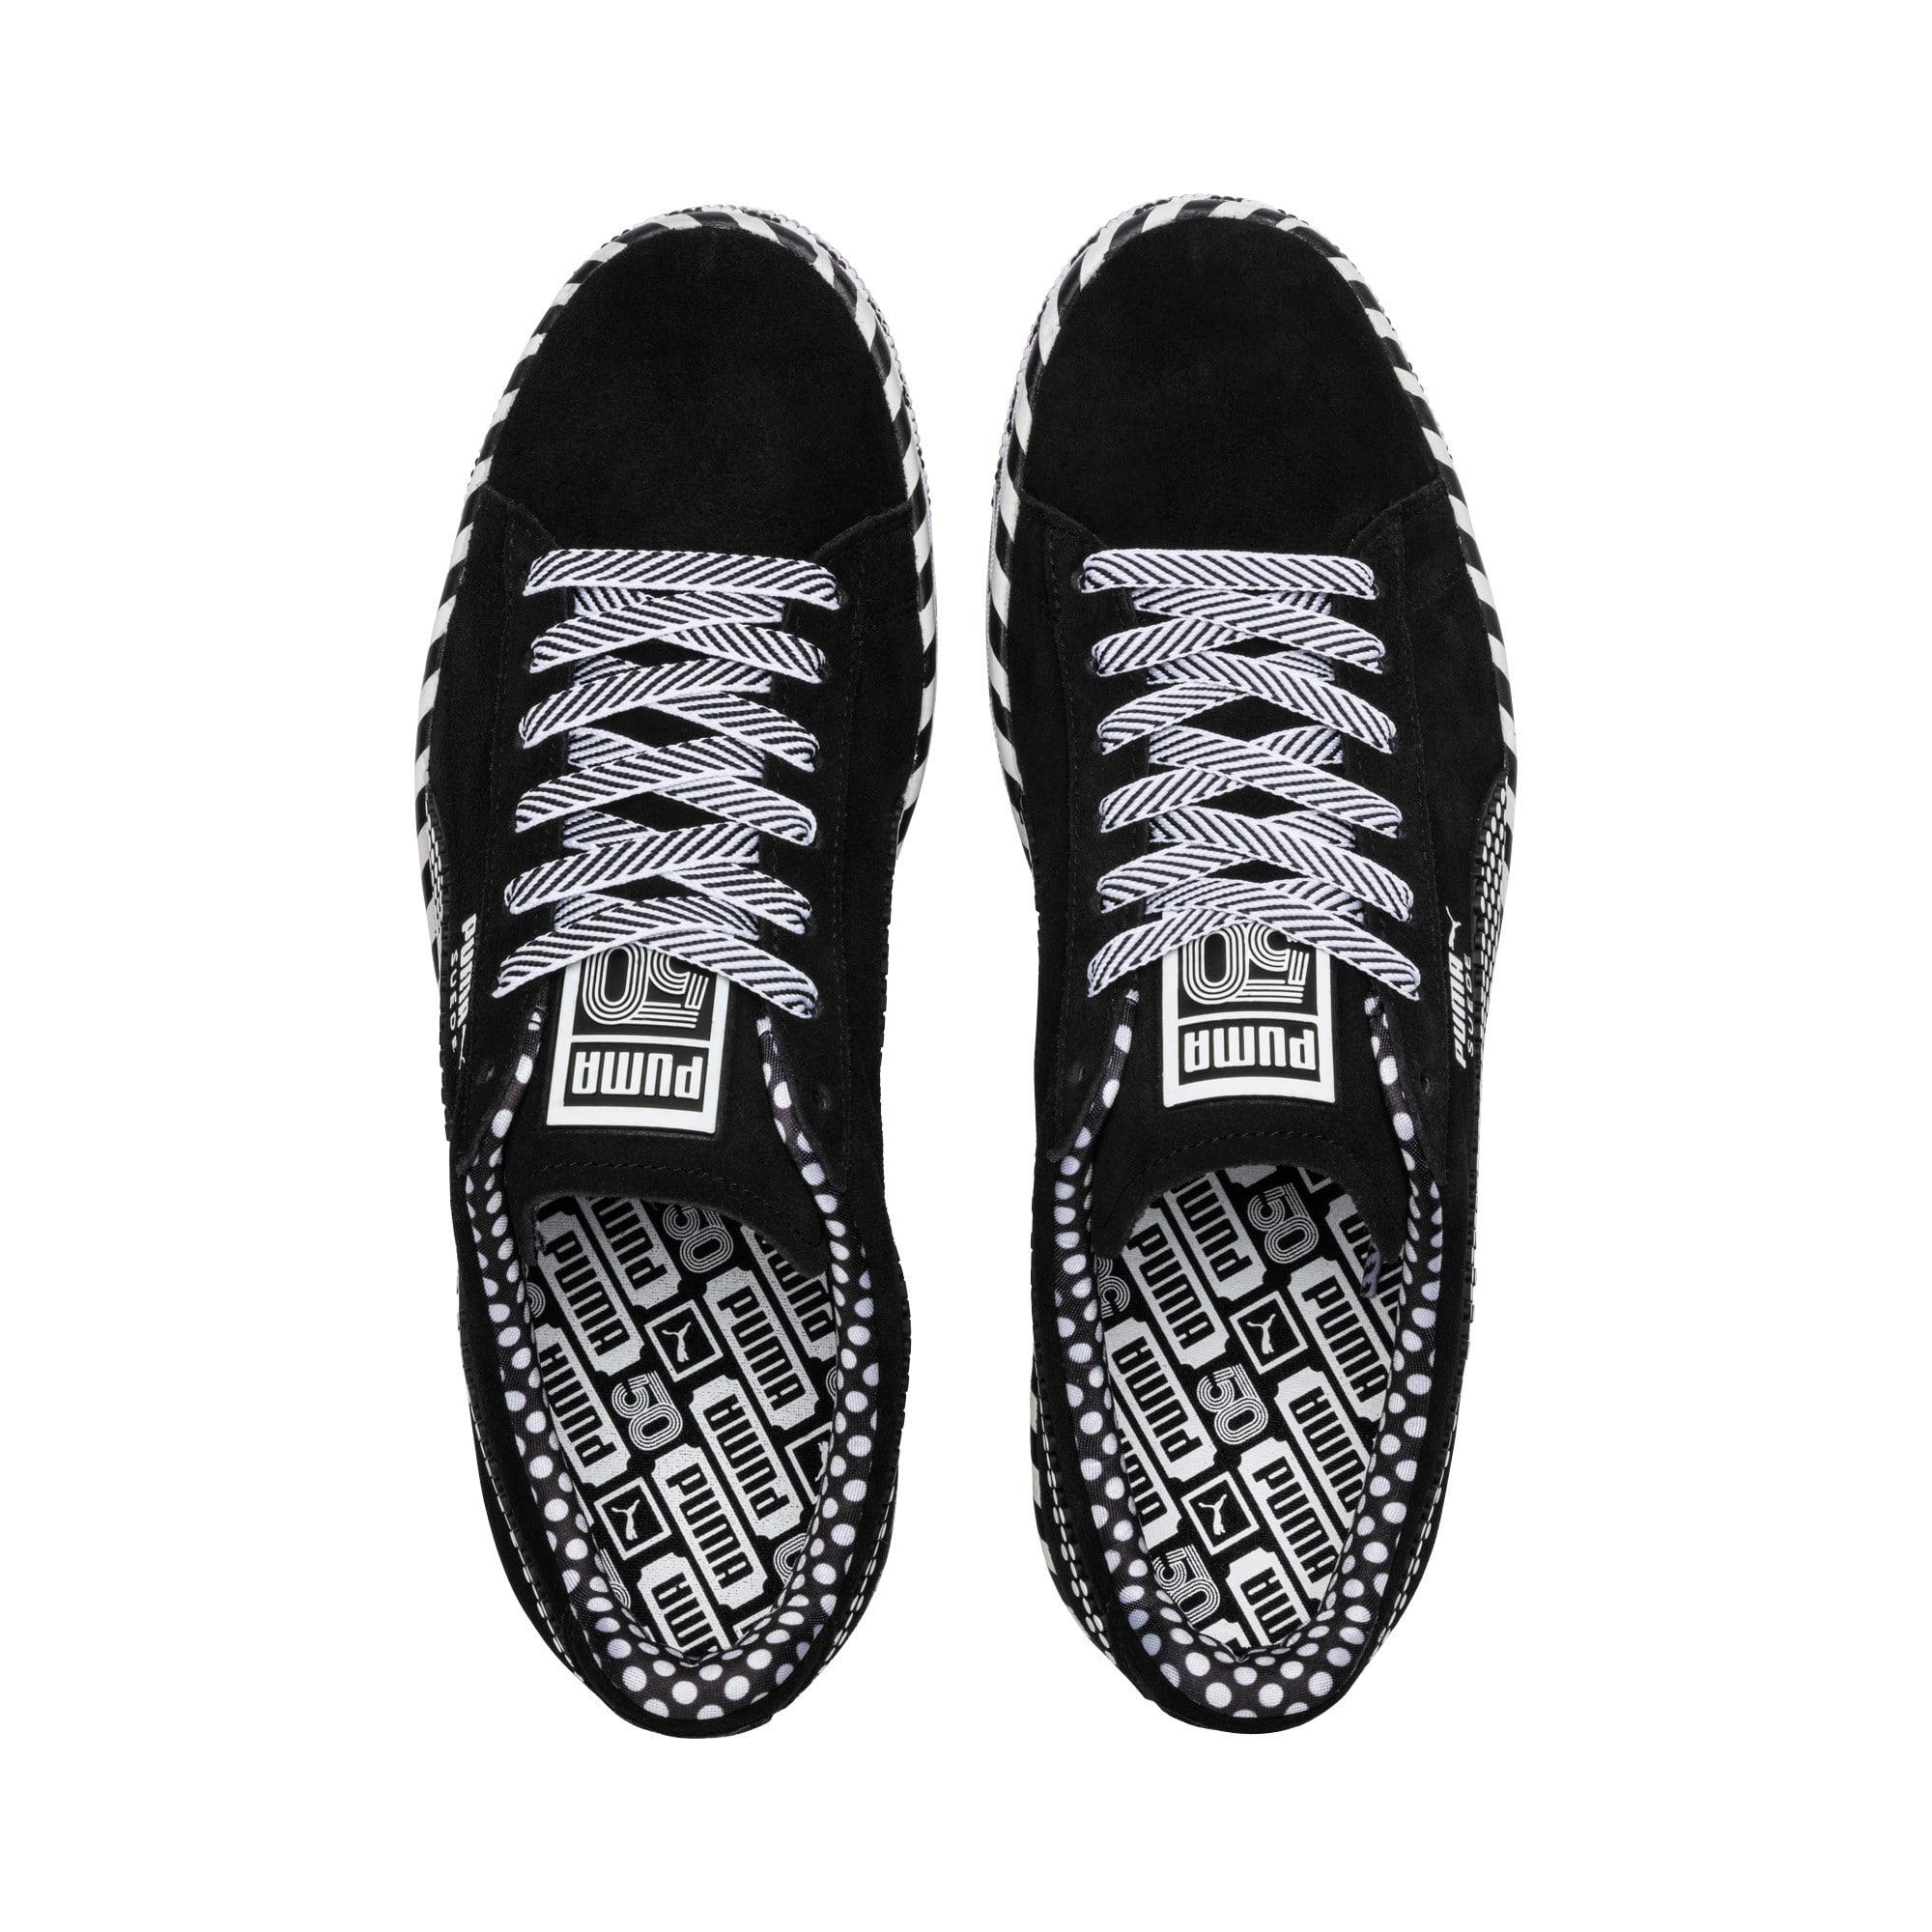 Thumbnail 7 of Suede Classic Pop Culture Sneakers, Puma Black-Puma White, medium